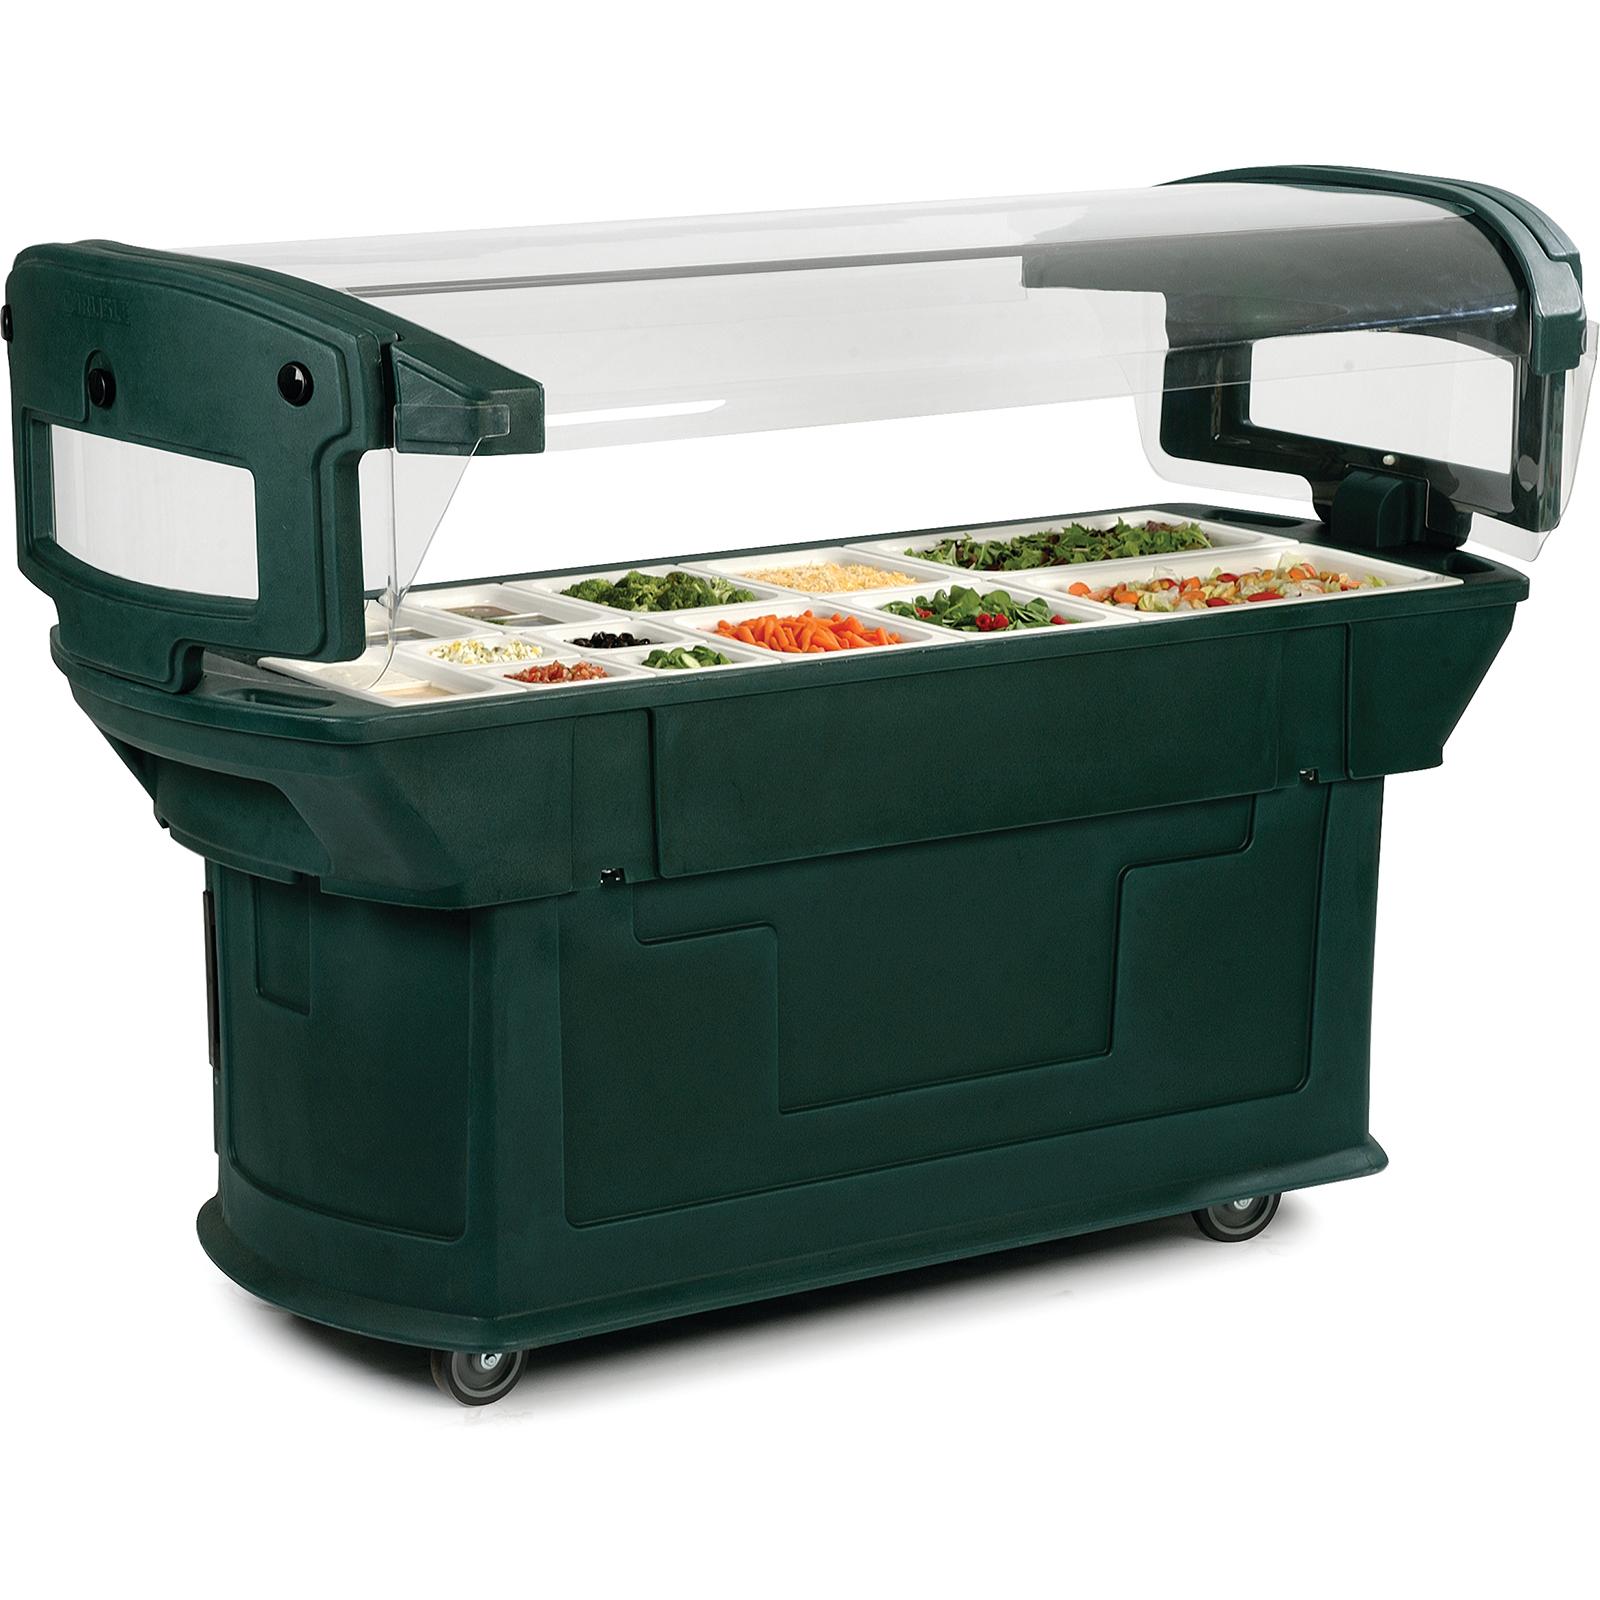 Carlisle 771159 serving counter, cold food